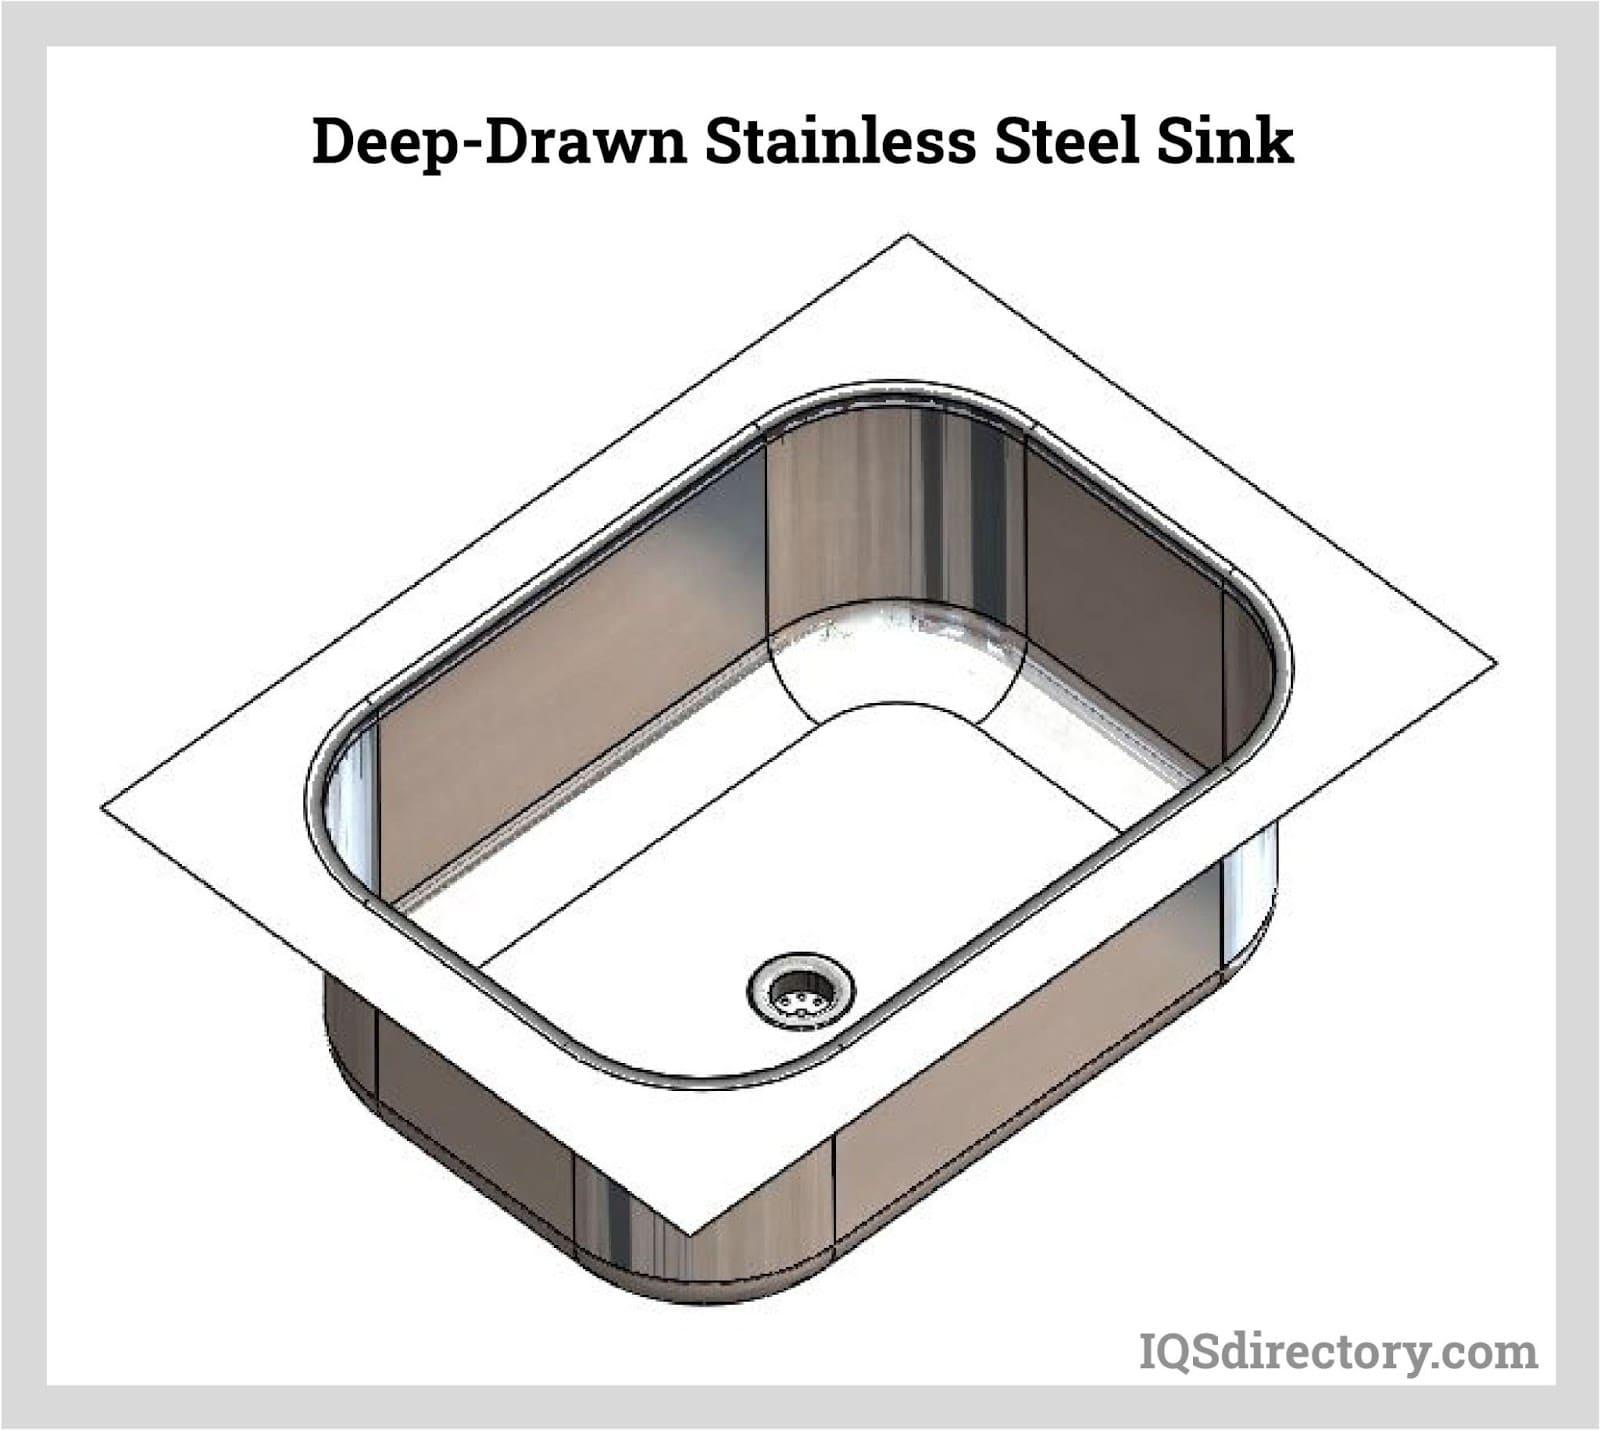 Deep-Drawn Stainless Steel Sink